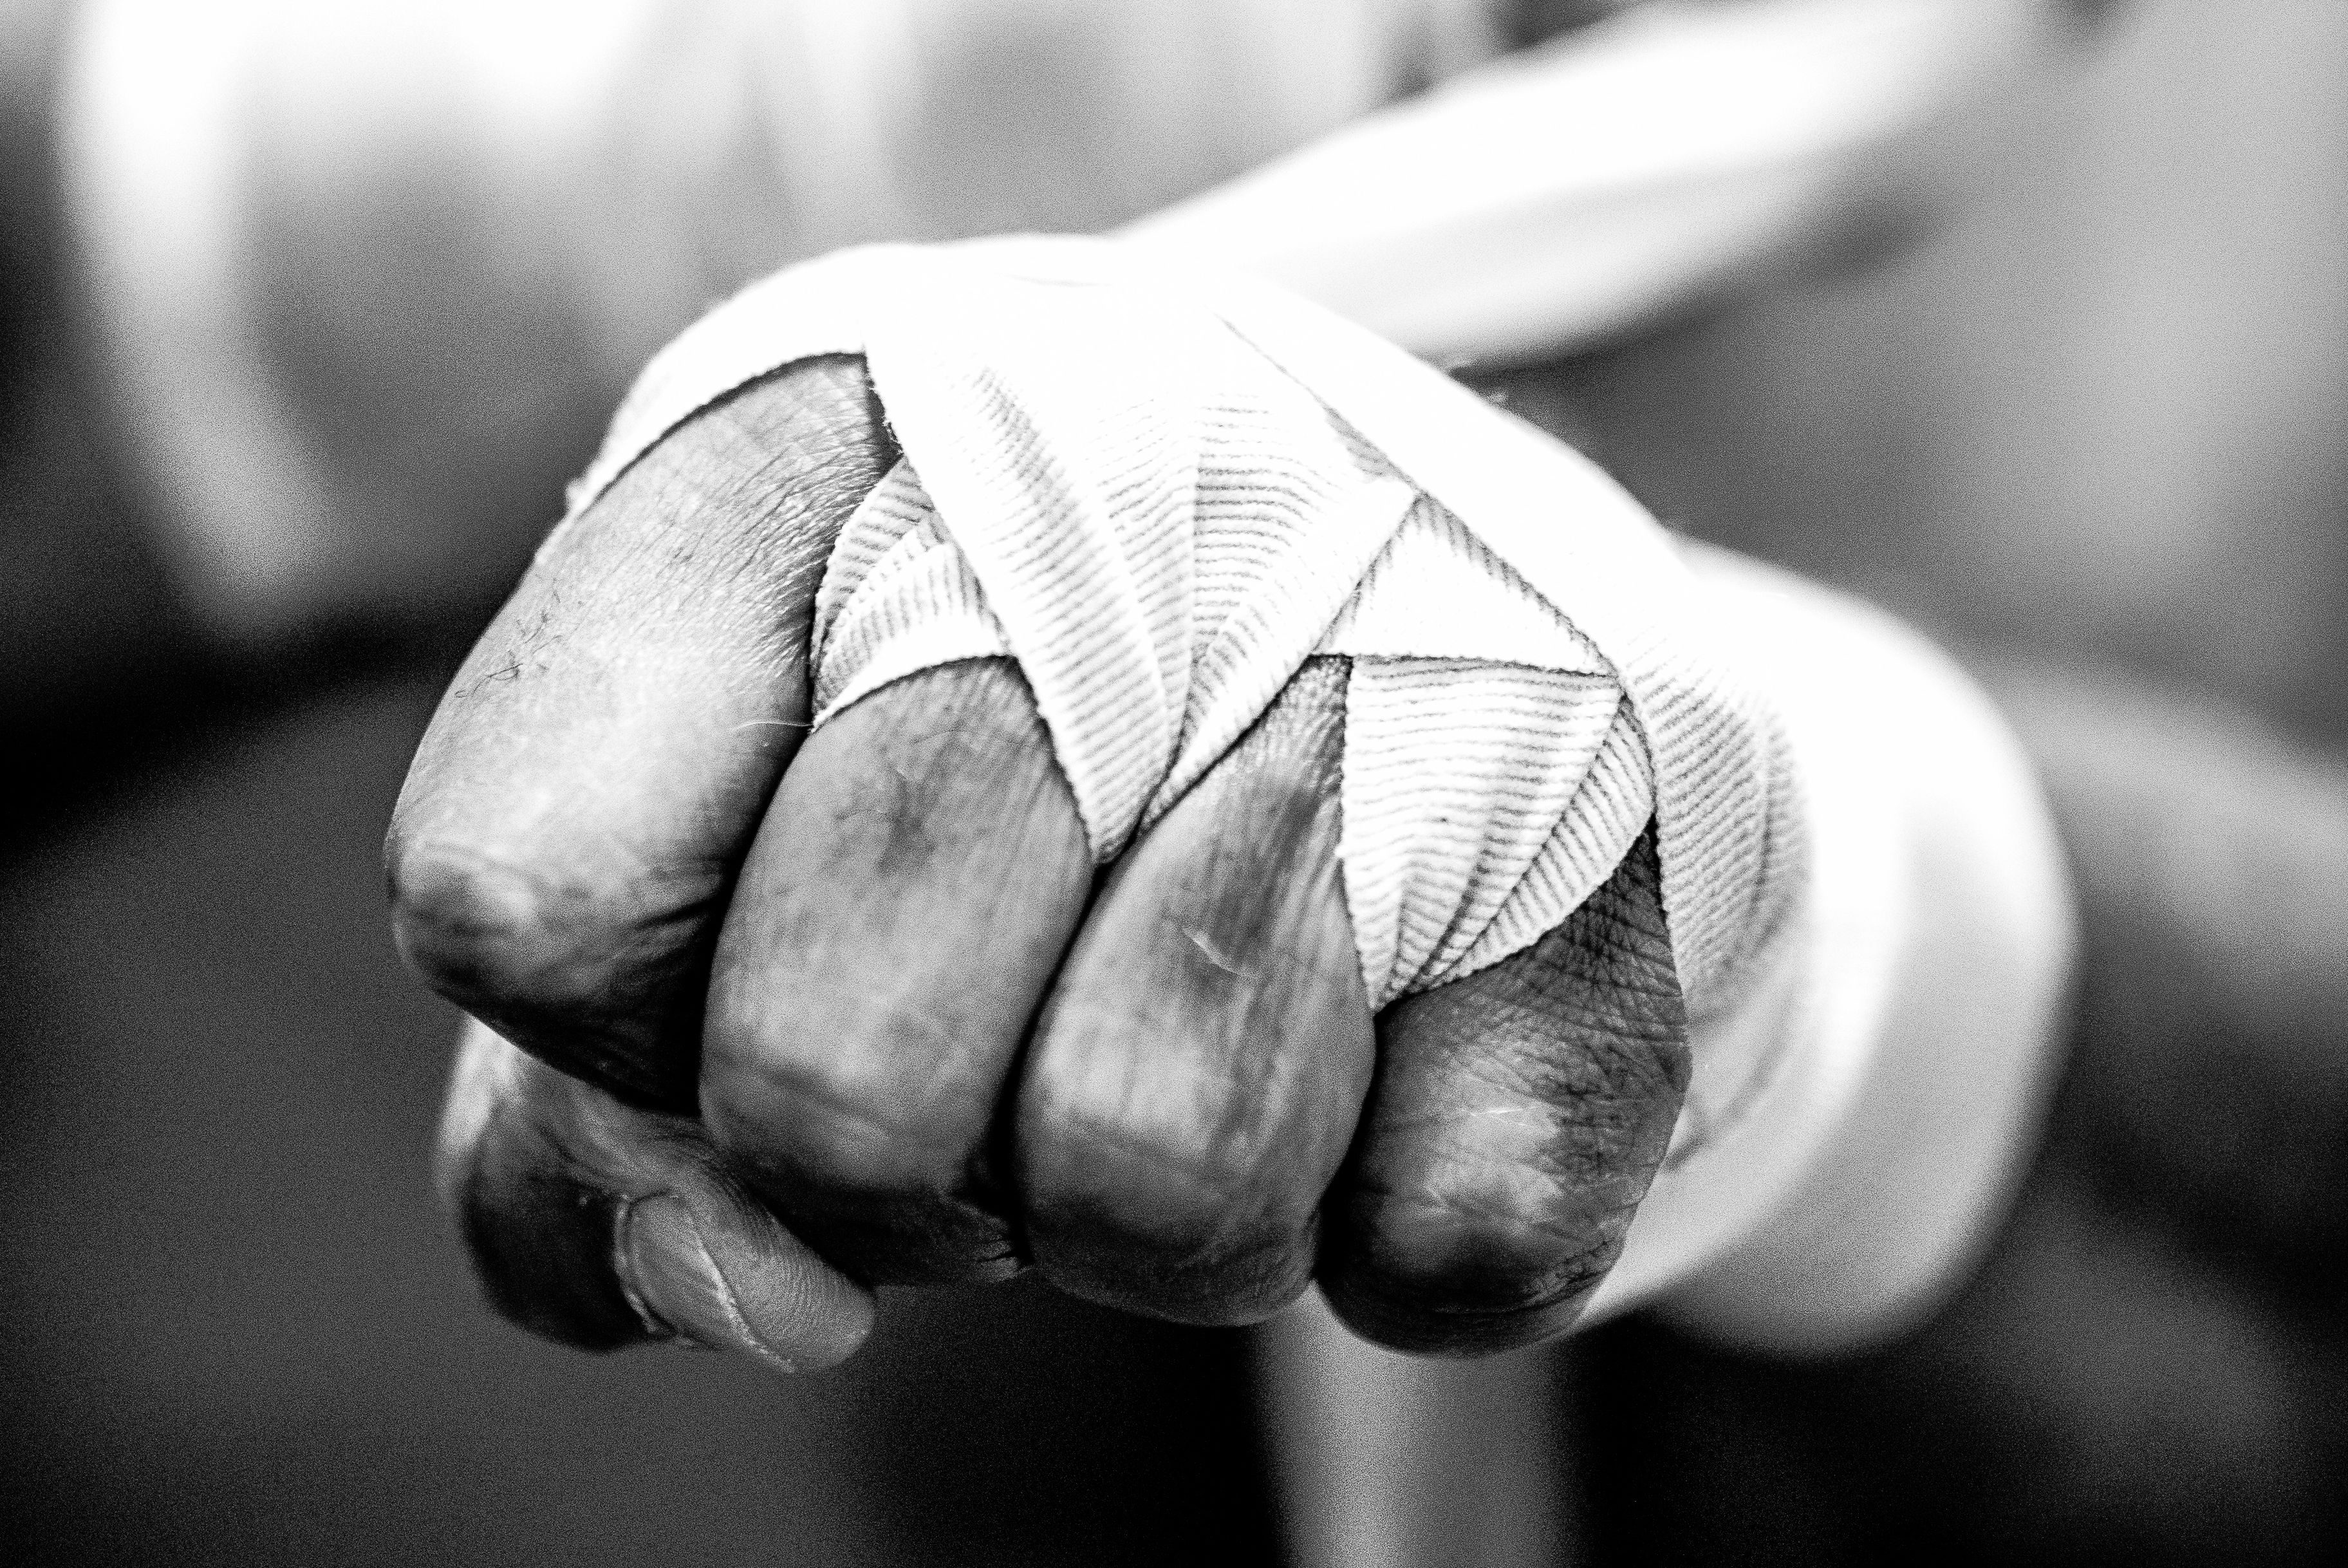 Lefthook vanportmosaic boxinghand shawntesimms k3laiq